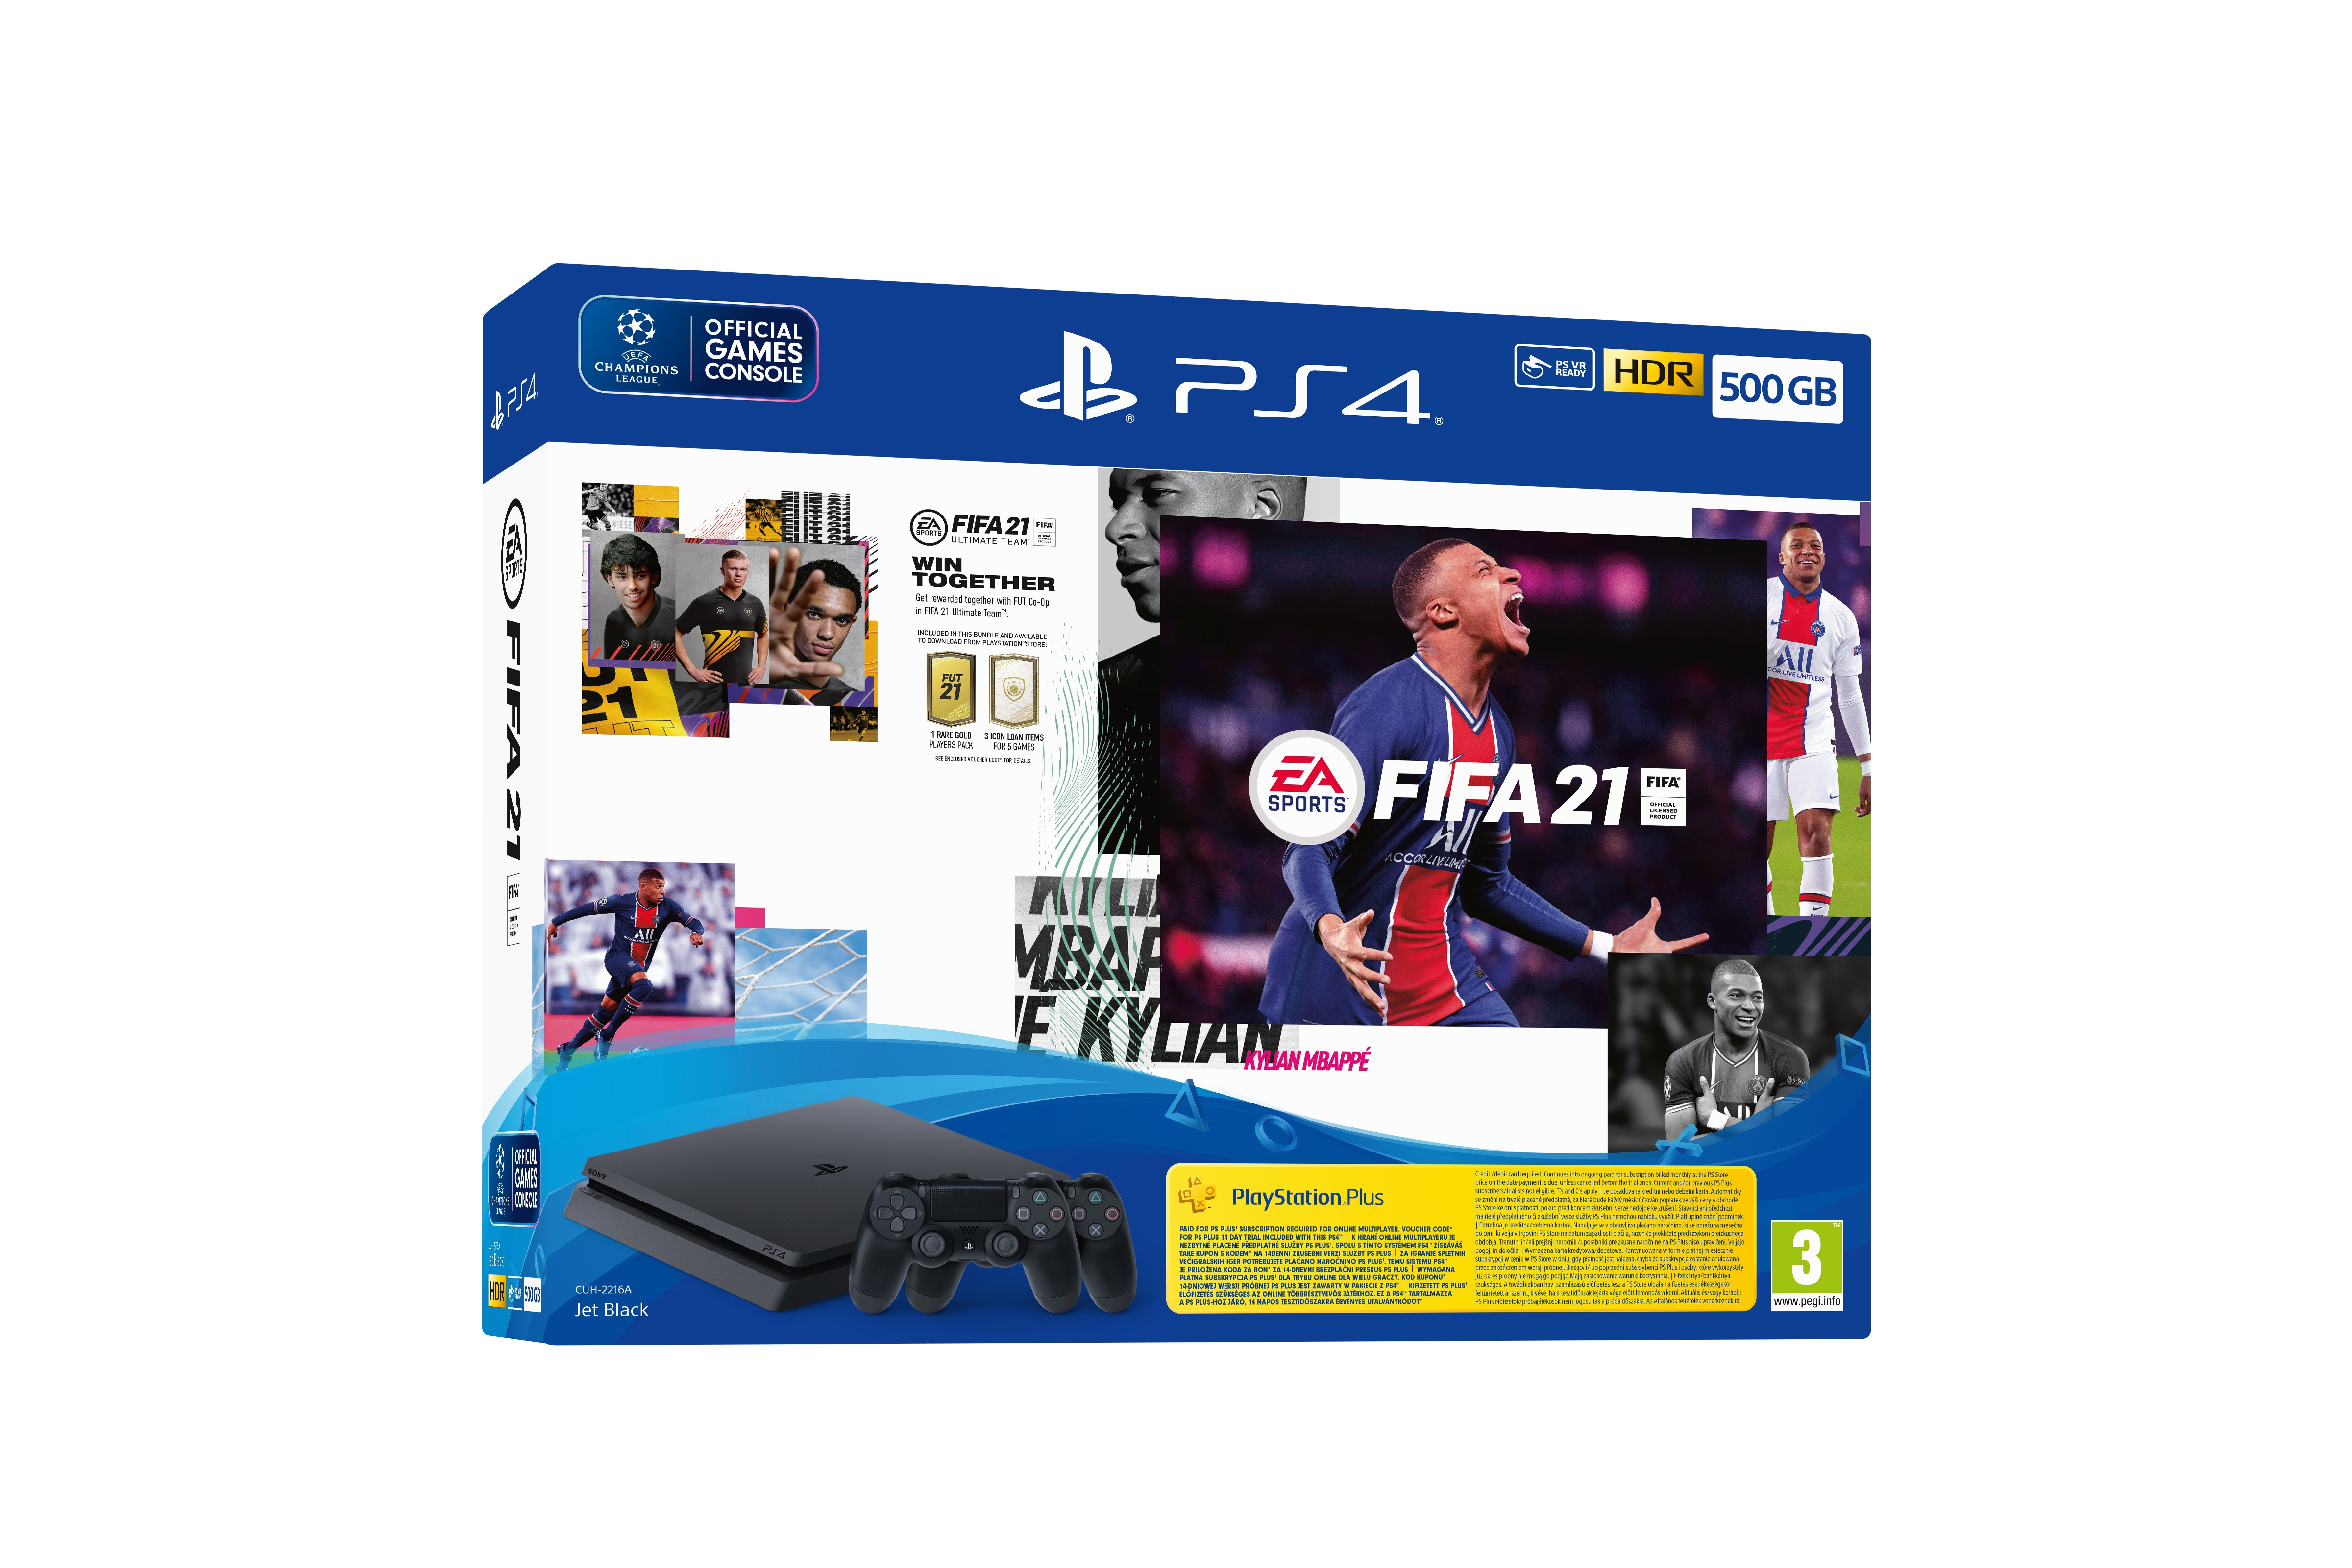 Igralna konzola Sony Playstation PS4 500GB set + FIFA 21/DS4